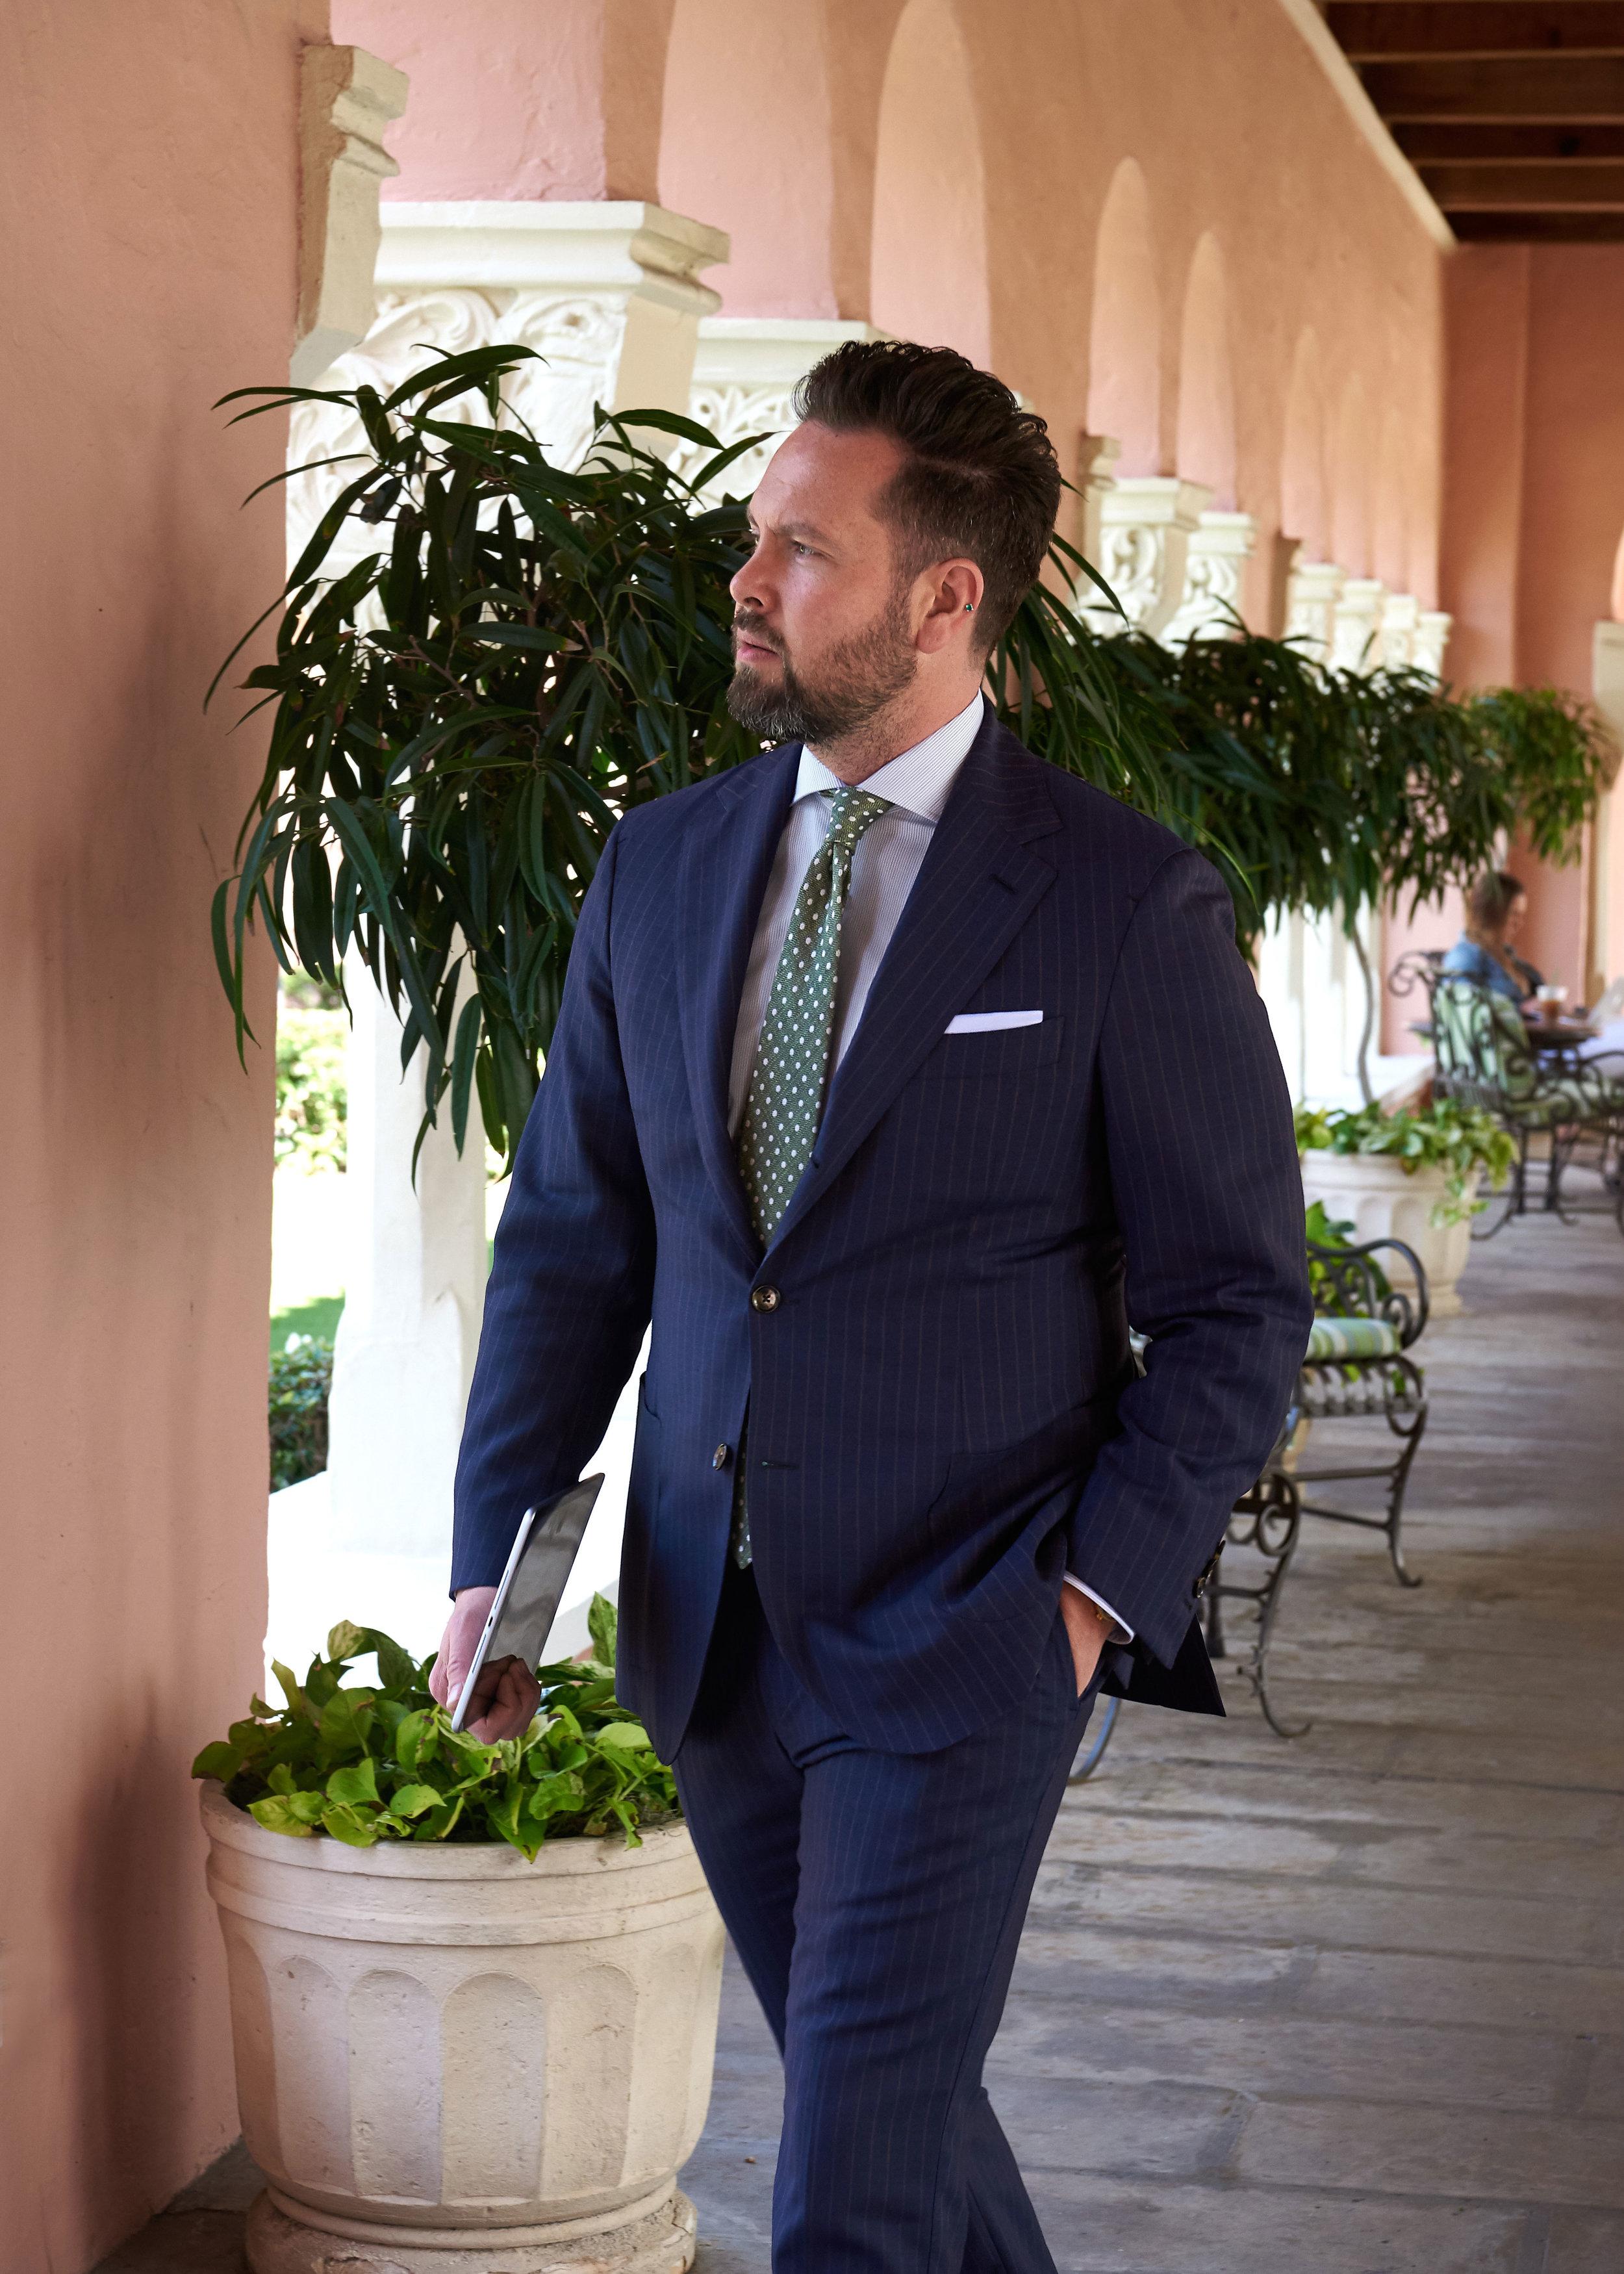 Suit Cloth :: Dormeuil Tonik Wool No. 290049, 295 gm  Made to Measure $3085  Bespoke $3760  Shirt Cloth :: Piumino Melange Twill, Thomas Mason No. F359762-13  Made to Measure $365  Bespoke $425